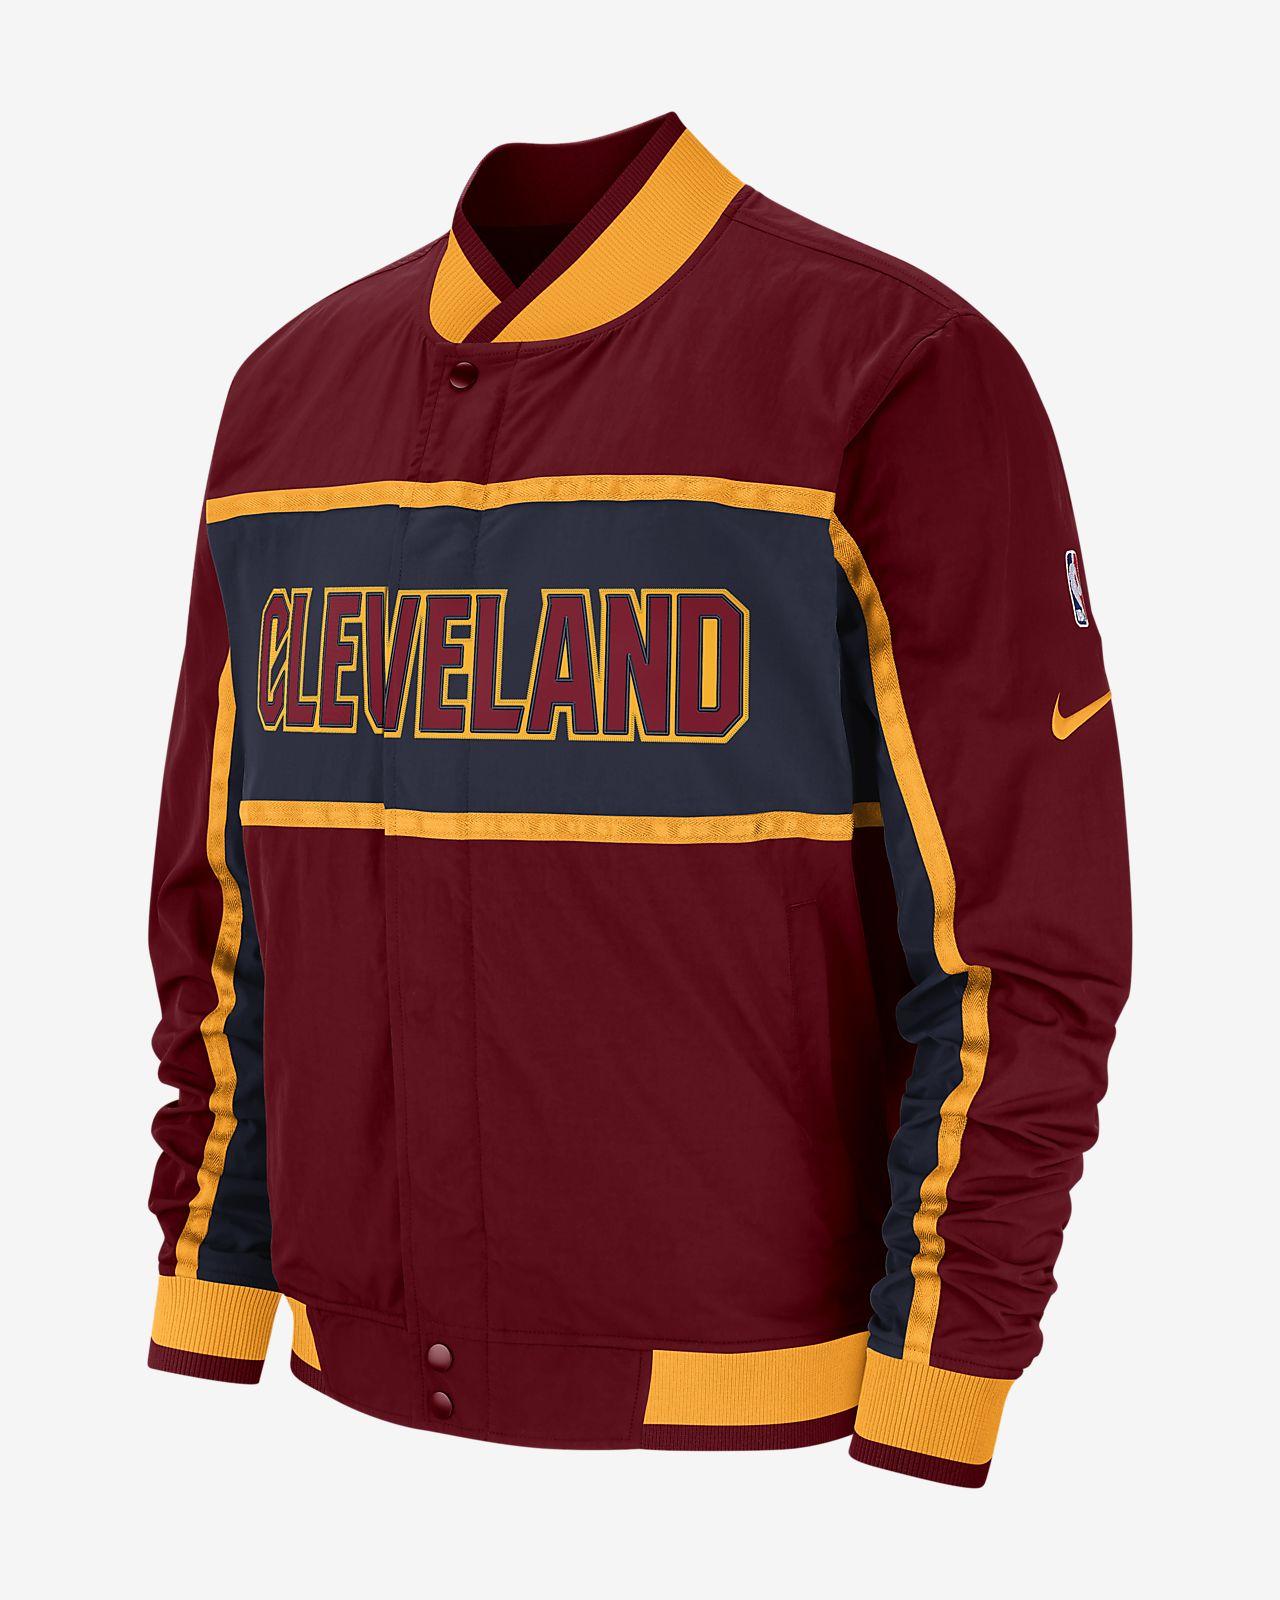 Cleveland Cavaliers Nike Courtside Chaqueta de la NBA - Hombre. Nike ... 9a471da6f65eb